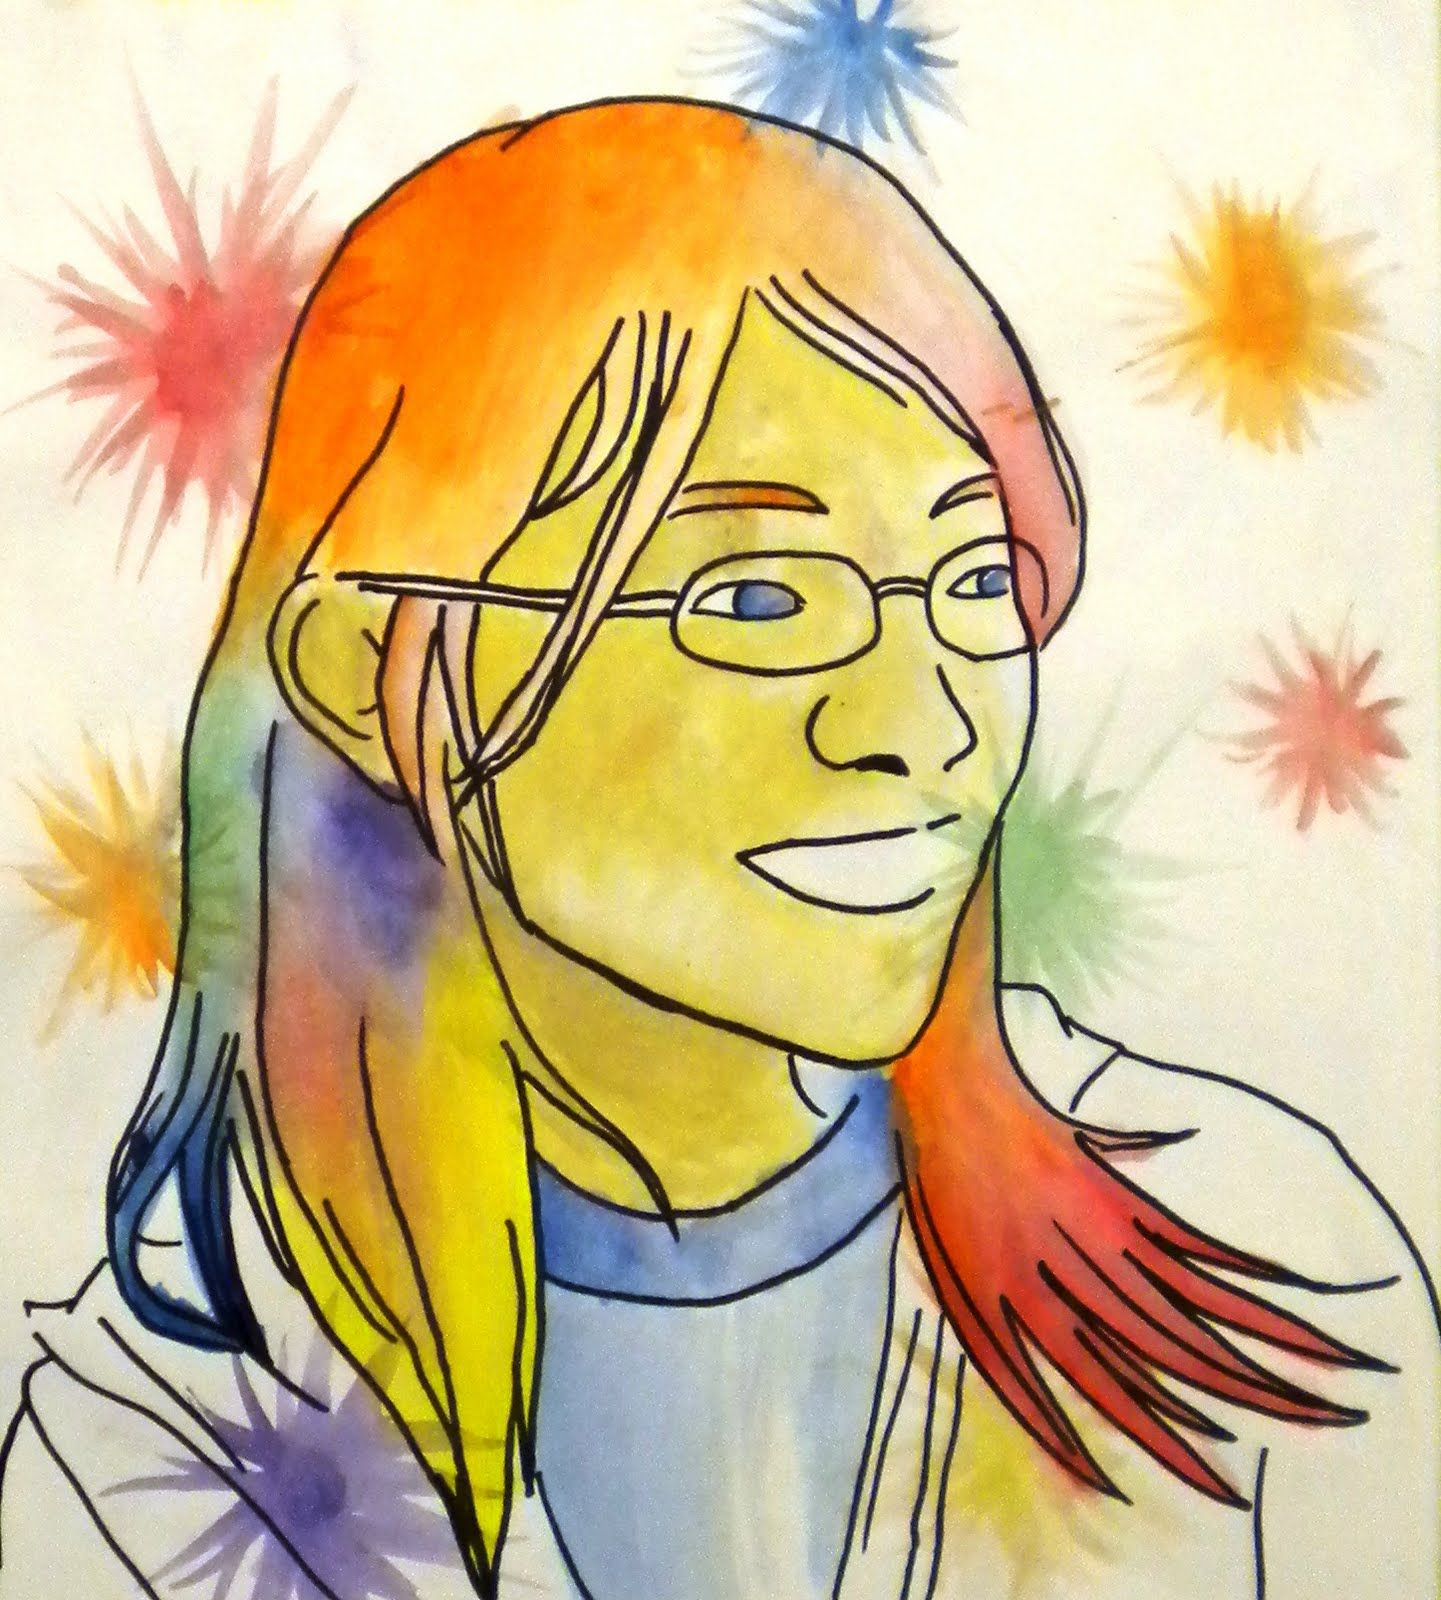 For The Love Of Art 6th Grade Pop Art Self Portraits